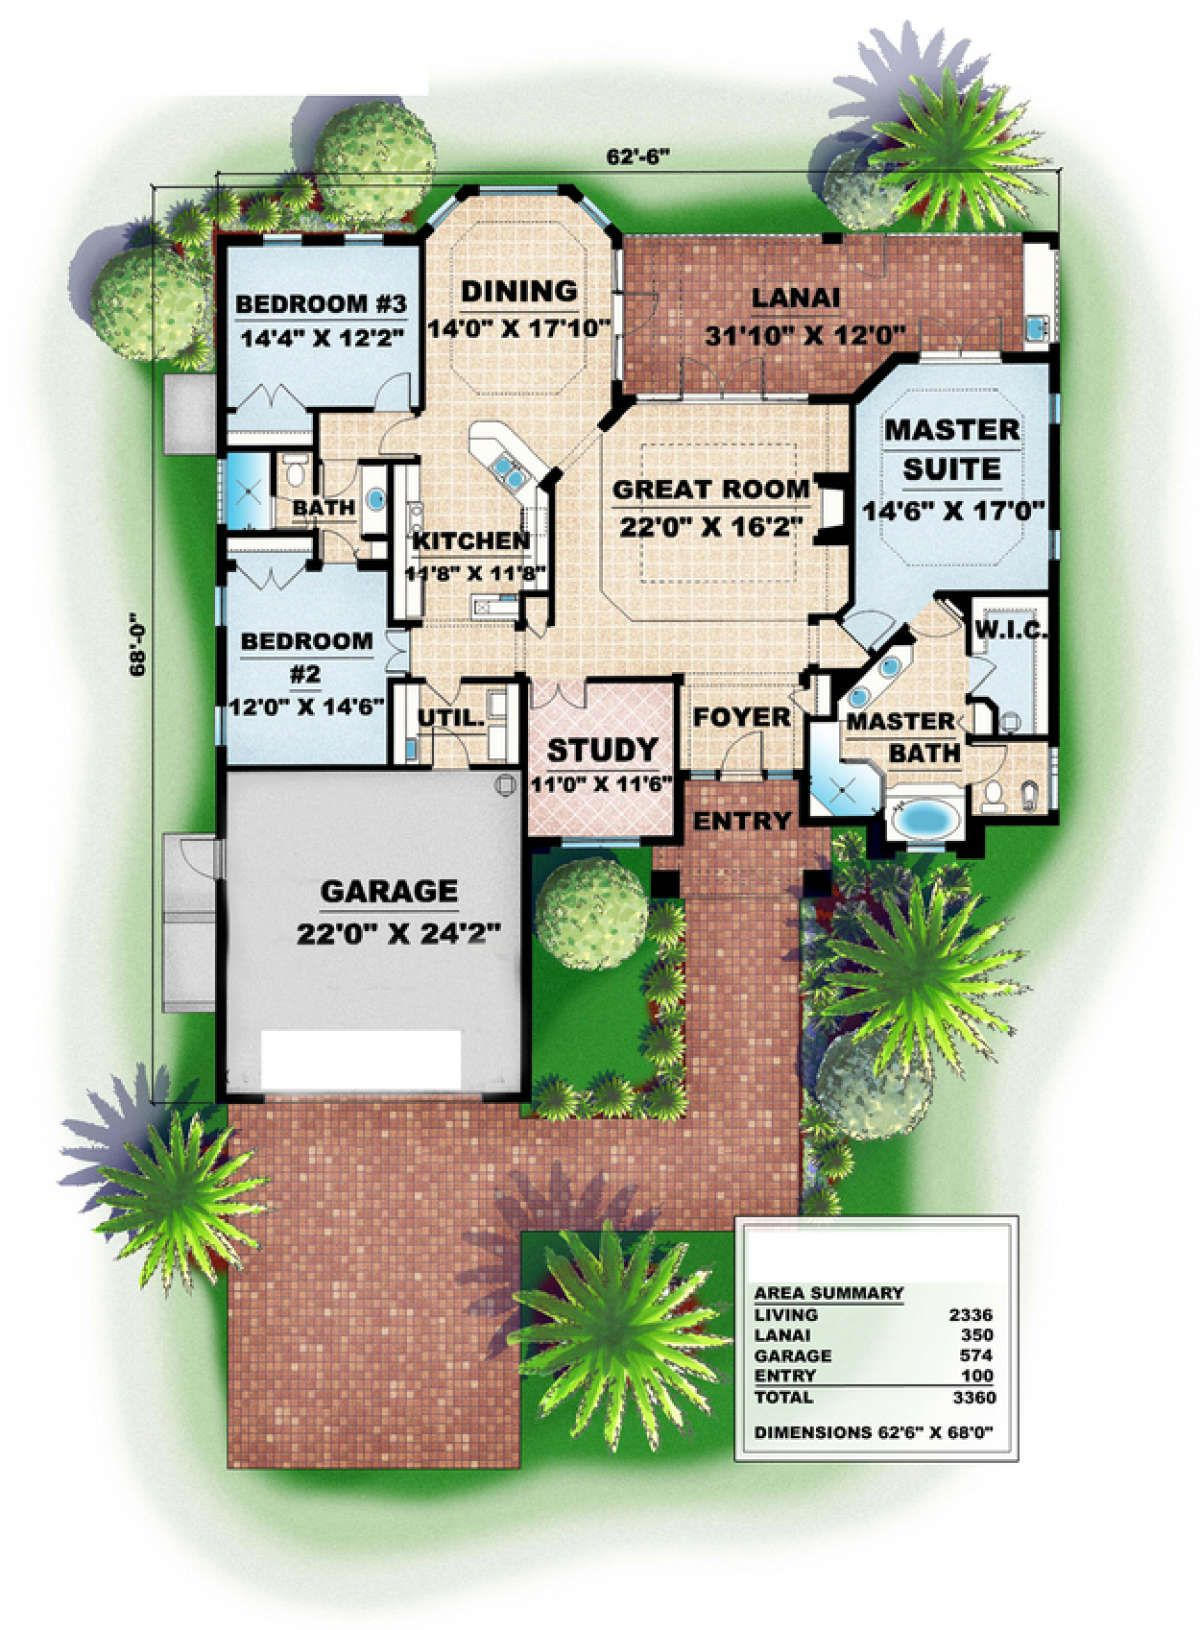 House Plan 575 00017 Florida Plan 2 336 Square Feet 3 Bedrooms 3 Bathrooms Florida House Plans Florida Design House Plans